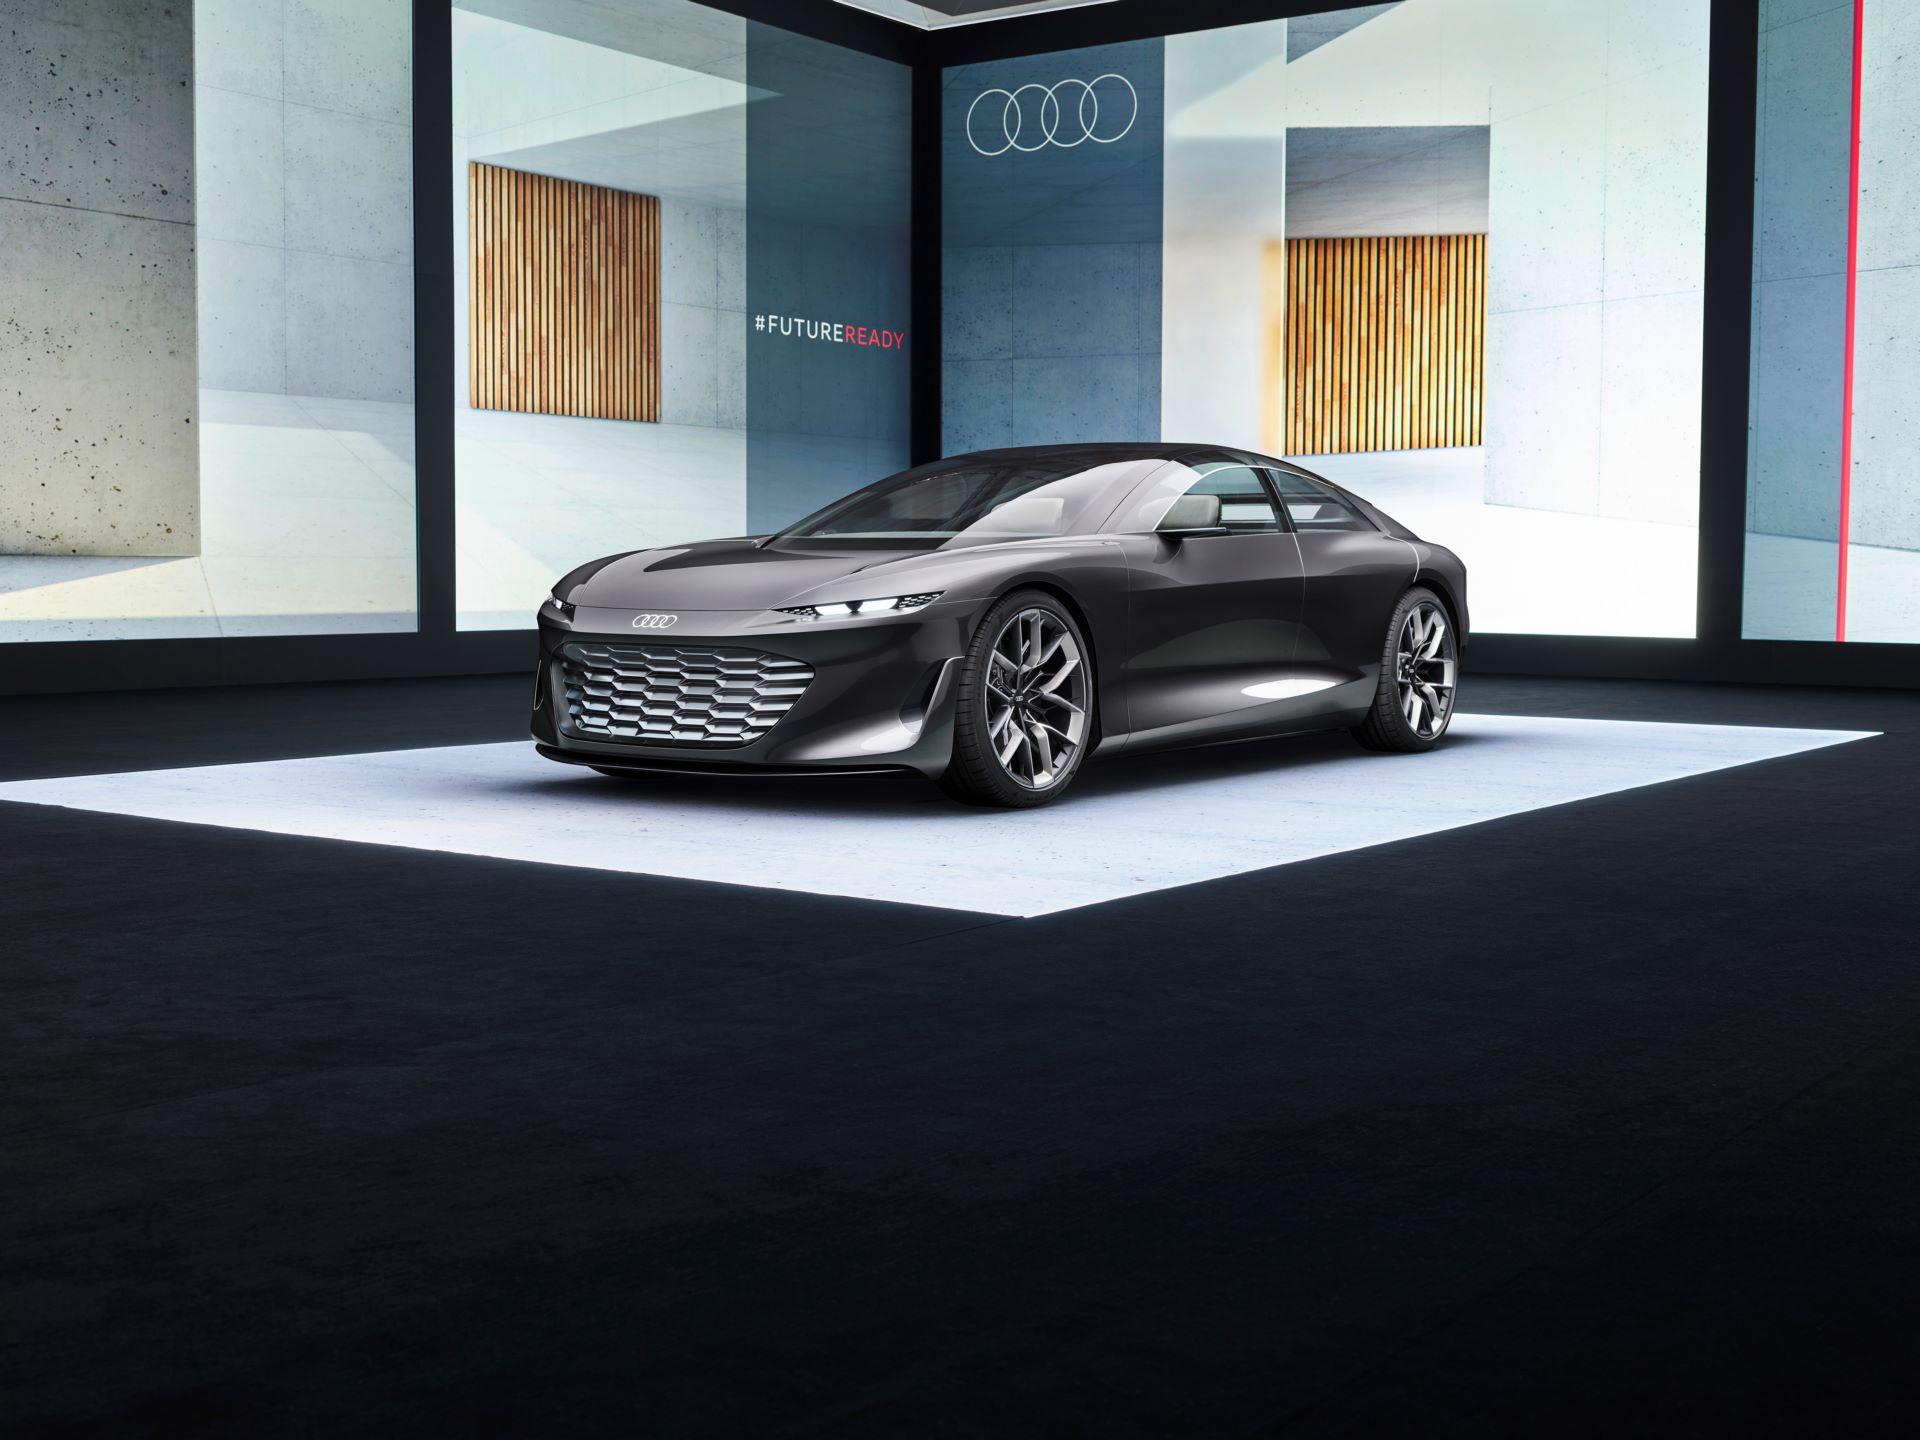 Audi-GrandSphere-concept-10